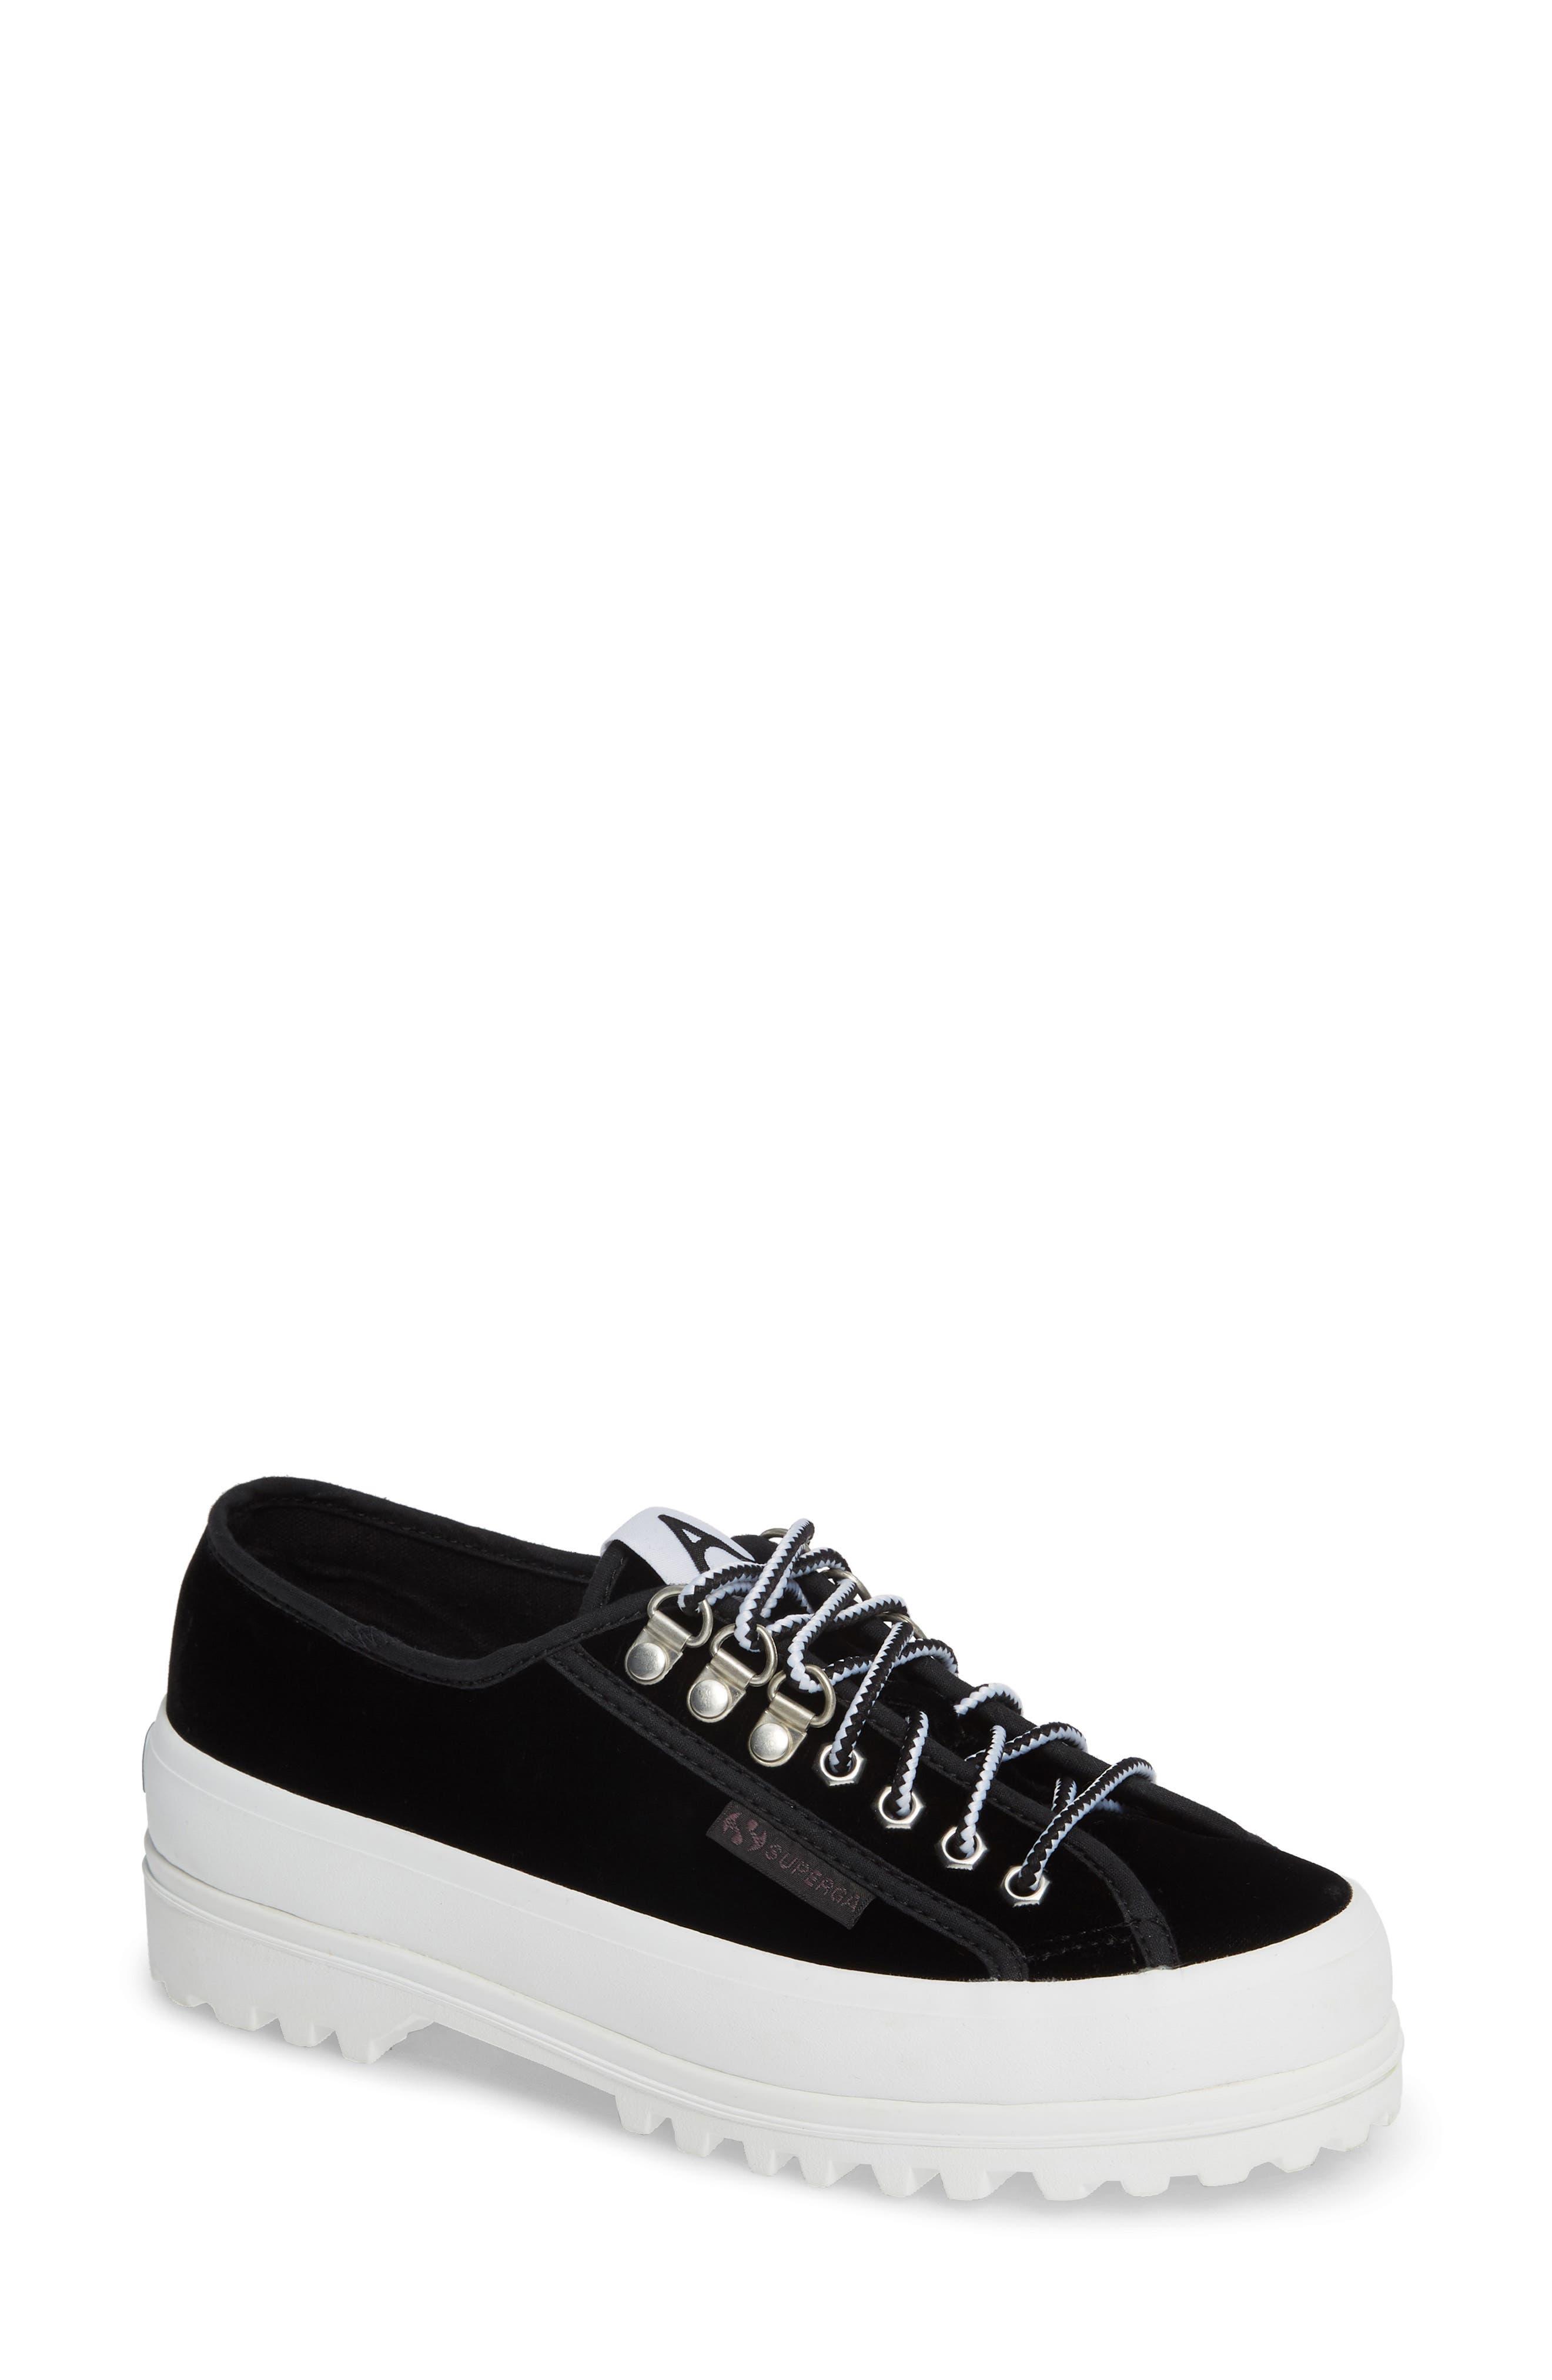 x Alexa Chung 2748 Veltvalpinaw Lugged Platform Sneaker,                             Main thumbnail 1, color,                             001